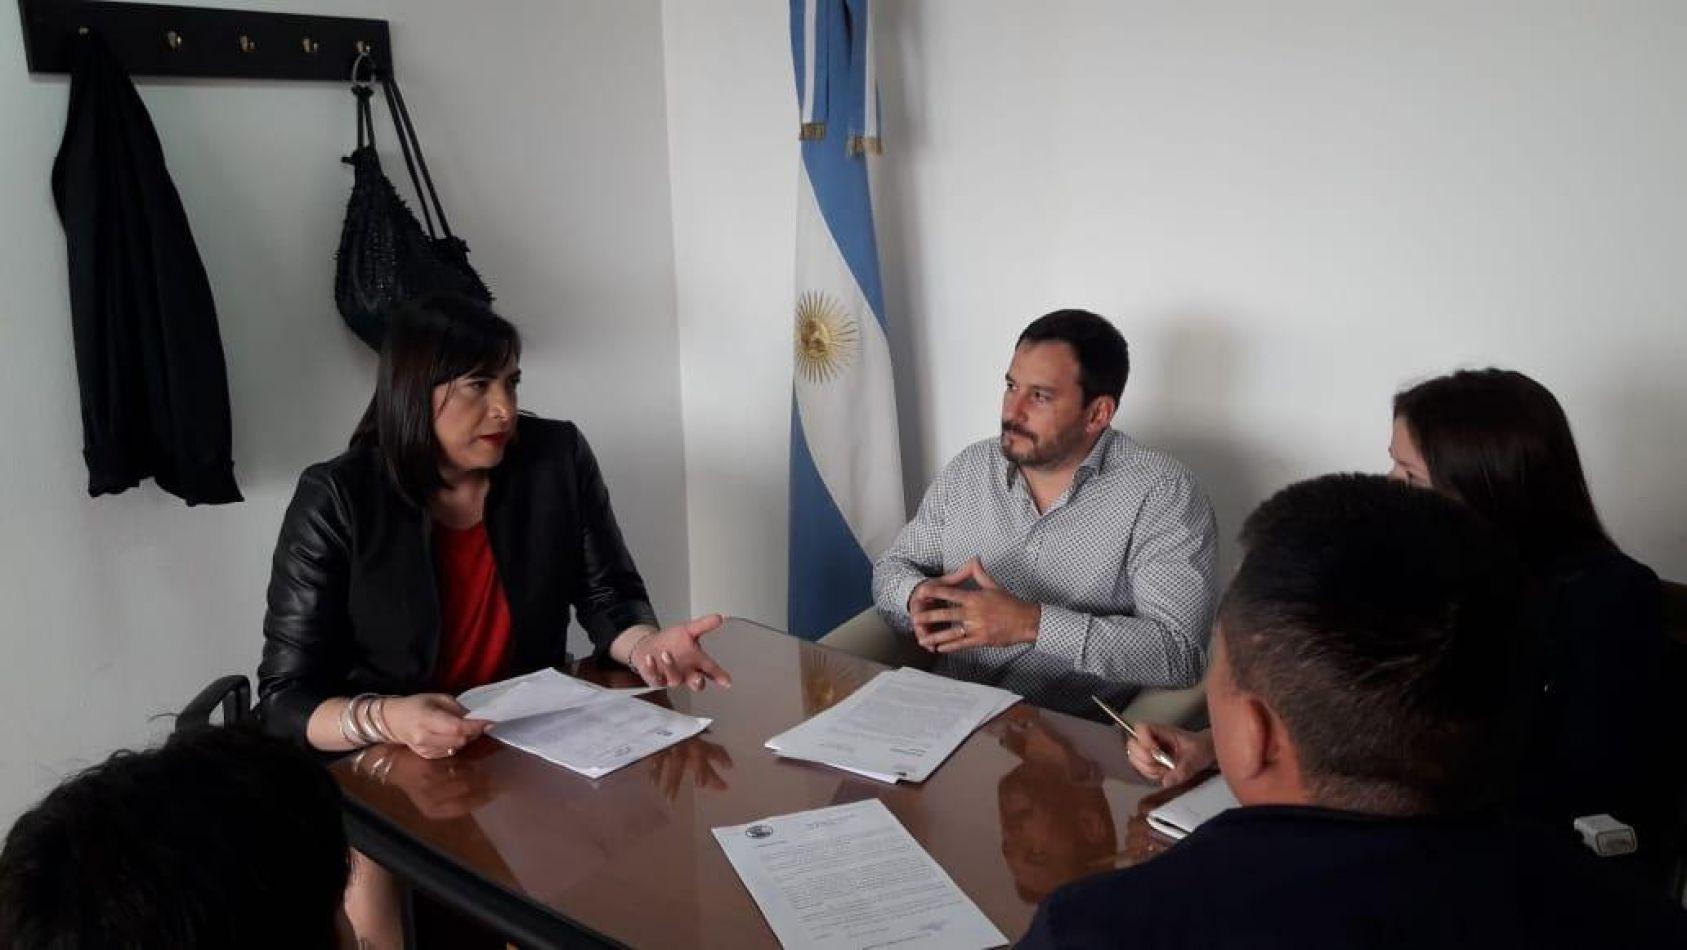 Reunión con representantes del Ministerio de Ciudadanía de Neuquén